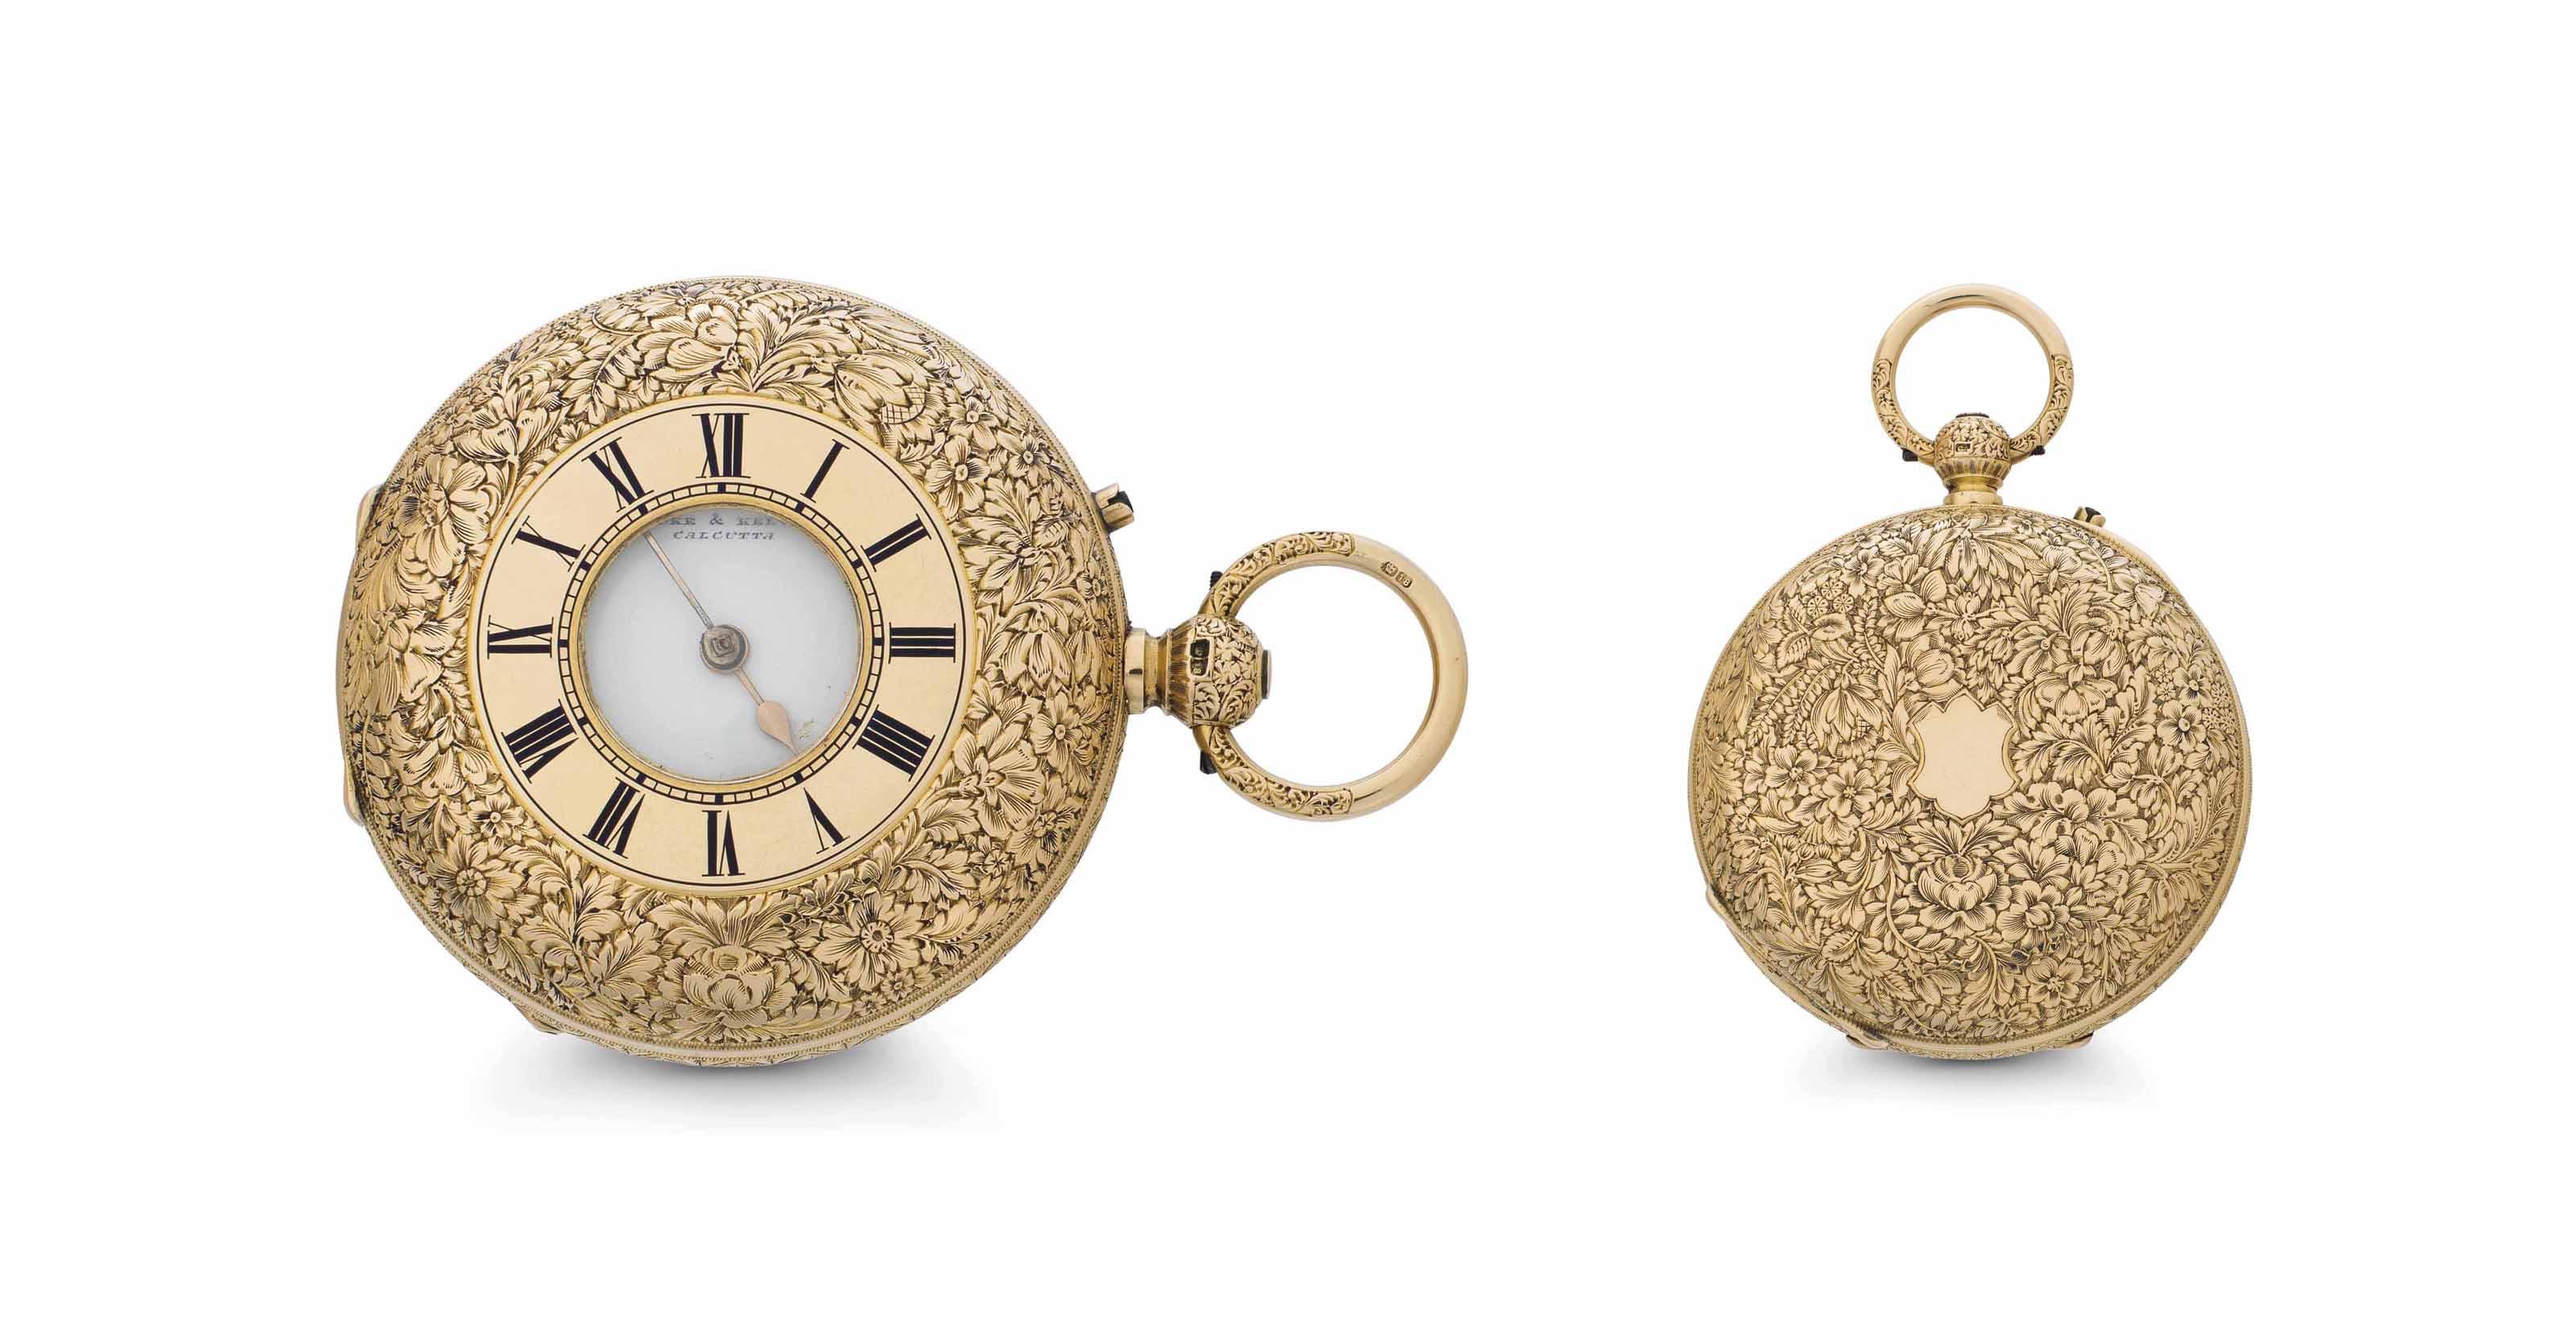 Cooke & Kelvey.  A Fine and Rare 18k Gold Key Wound Half-Hunter Case Striking Clock Watch